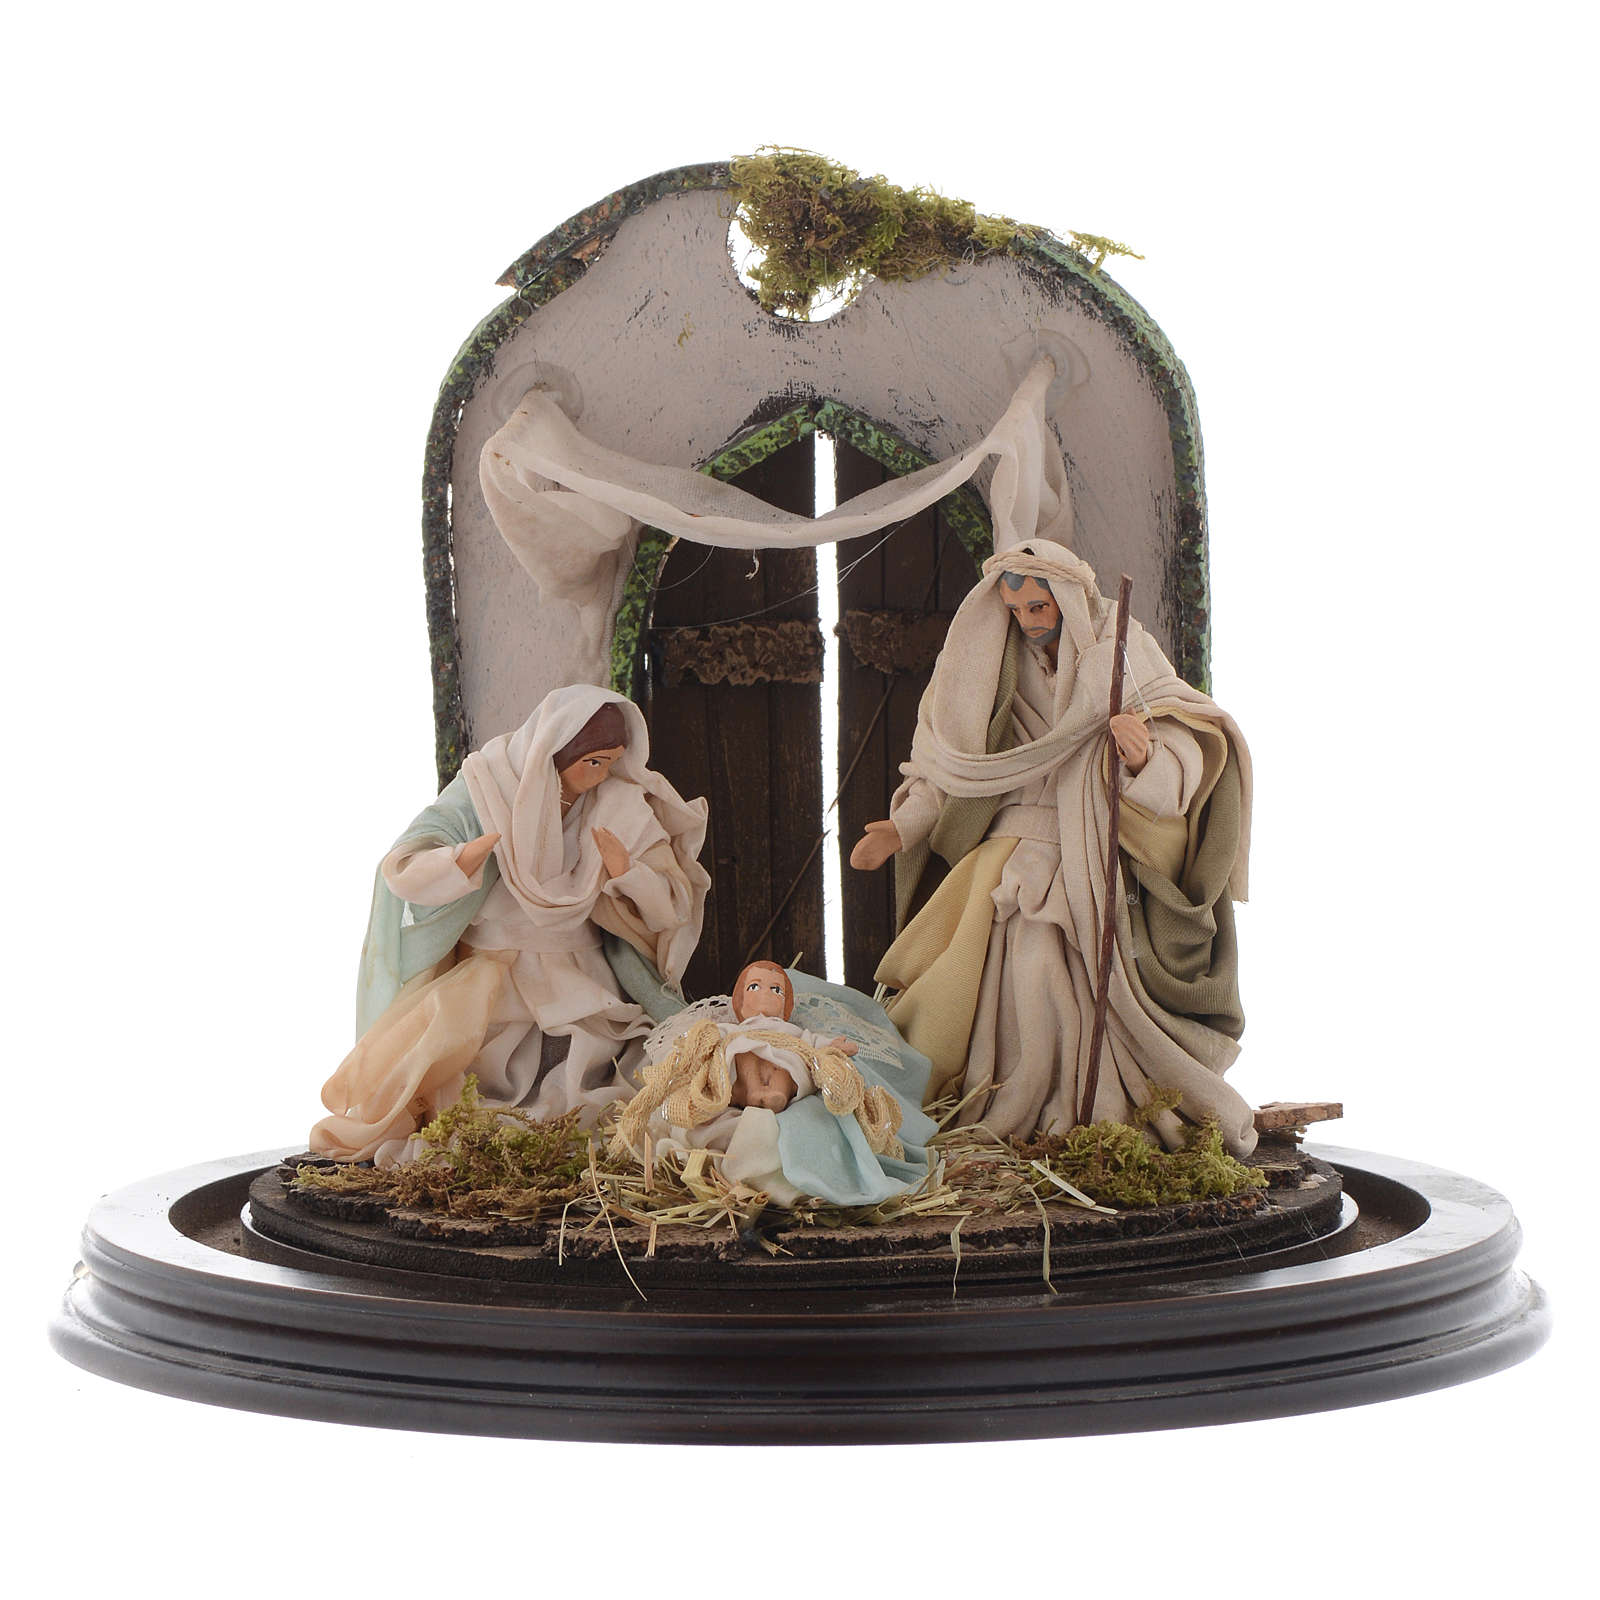 Escena Natividad cúpula vidrio pesebre napolitano 4